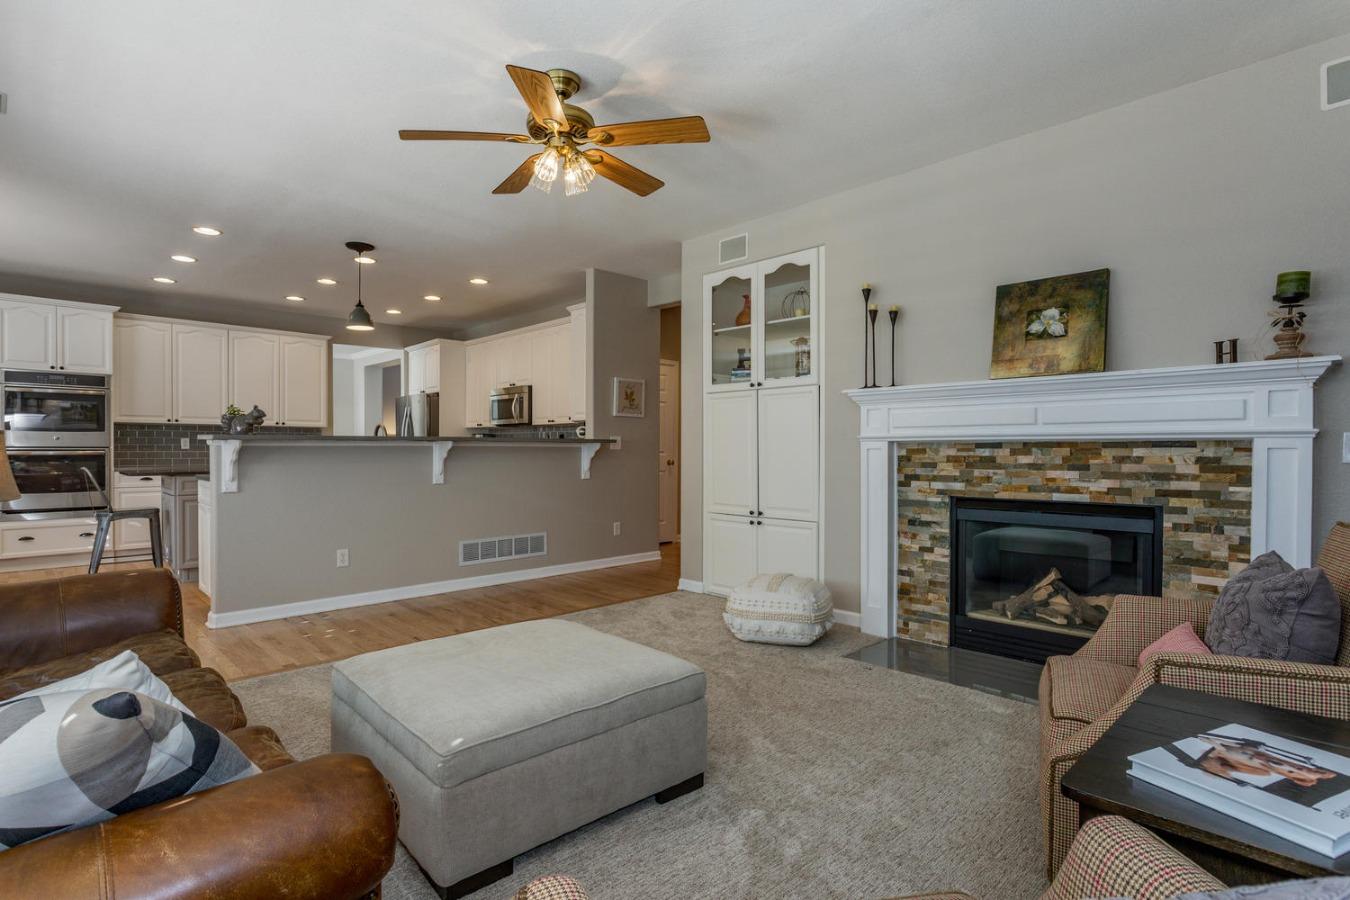 Sweet Main Floor Family Room Adjoins Kitchen Area